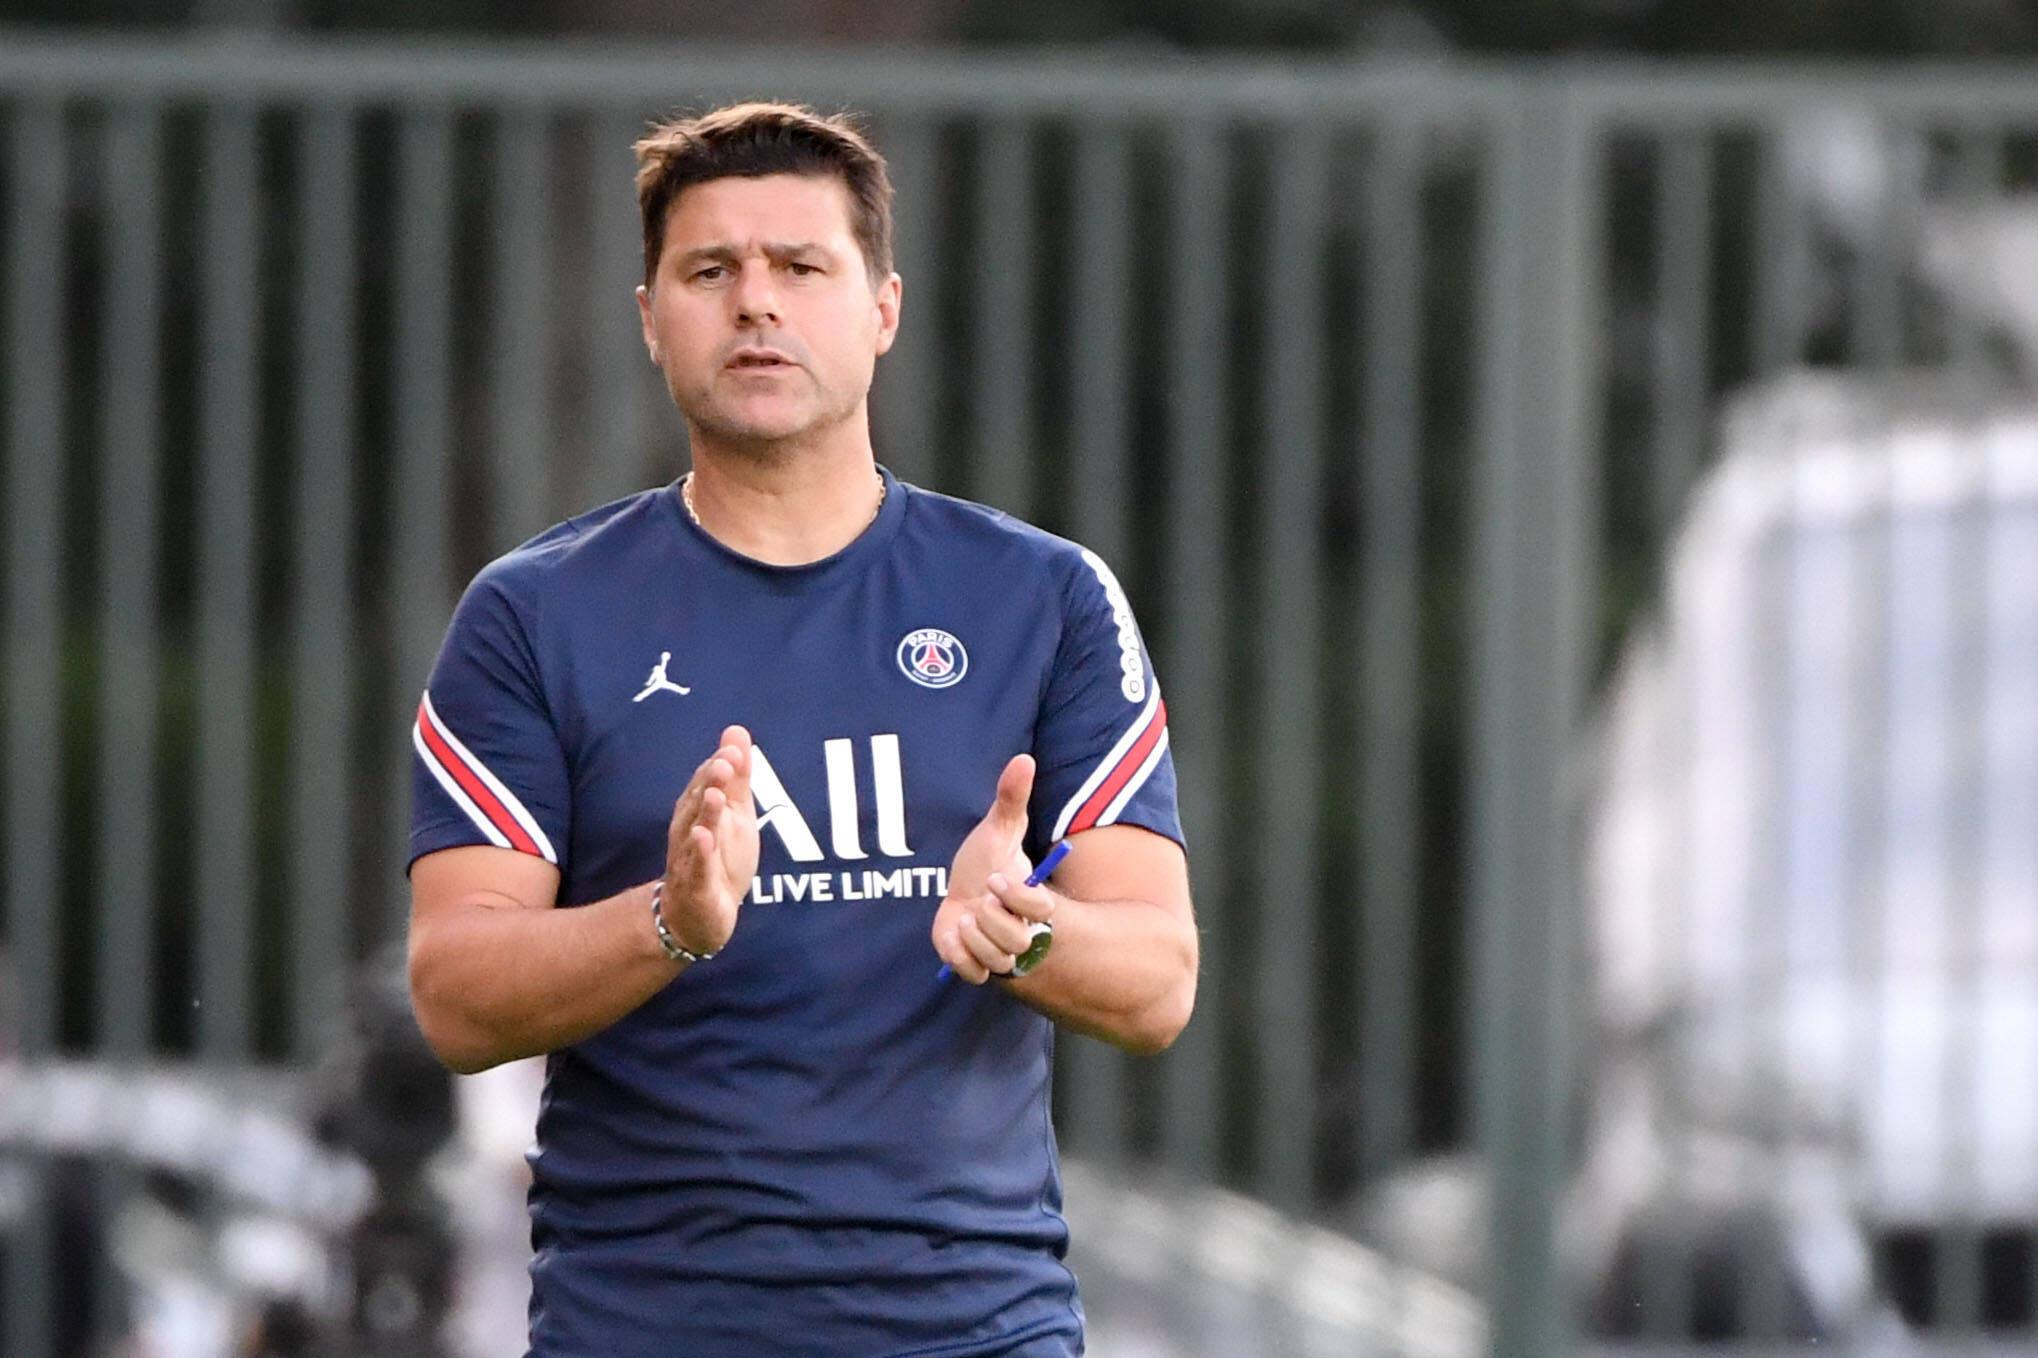 PSG coach, Maurico Pochettino names his Ballon d